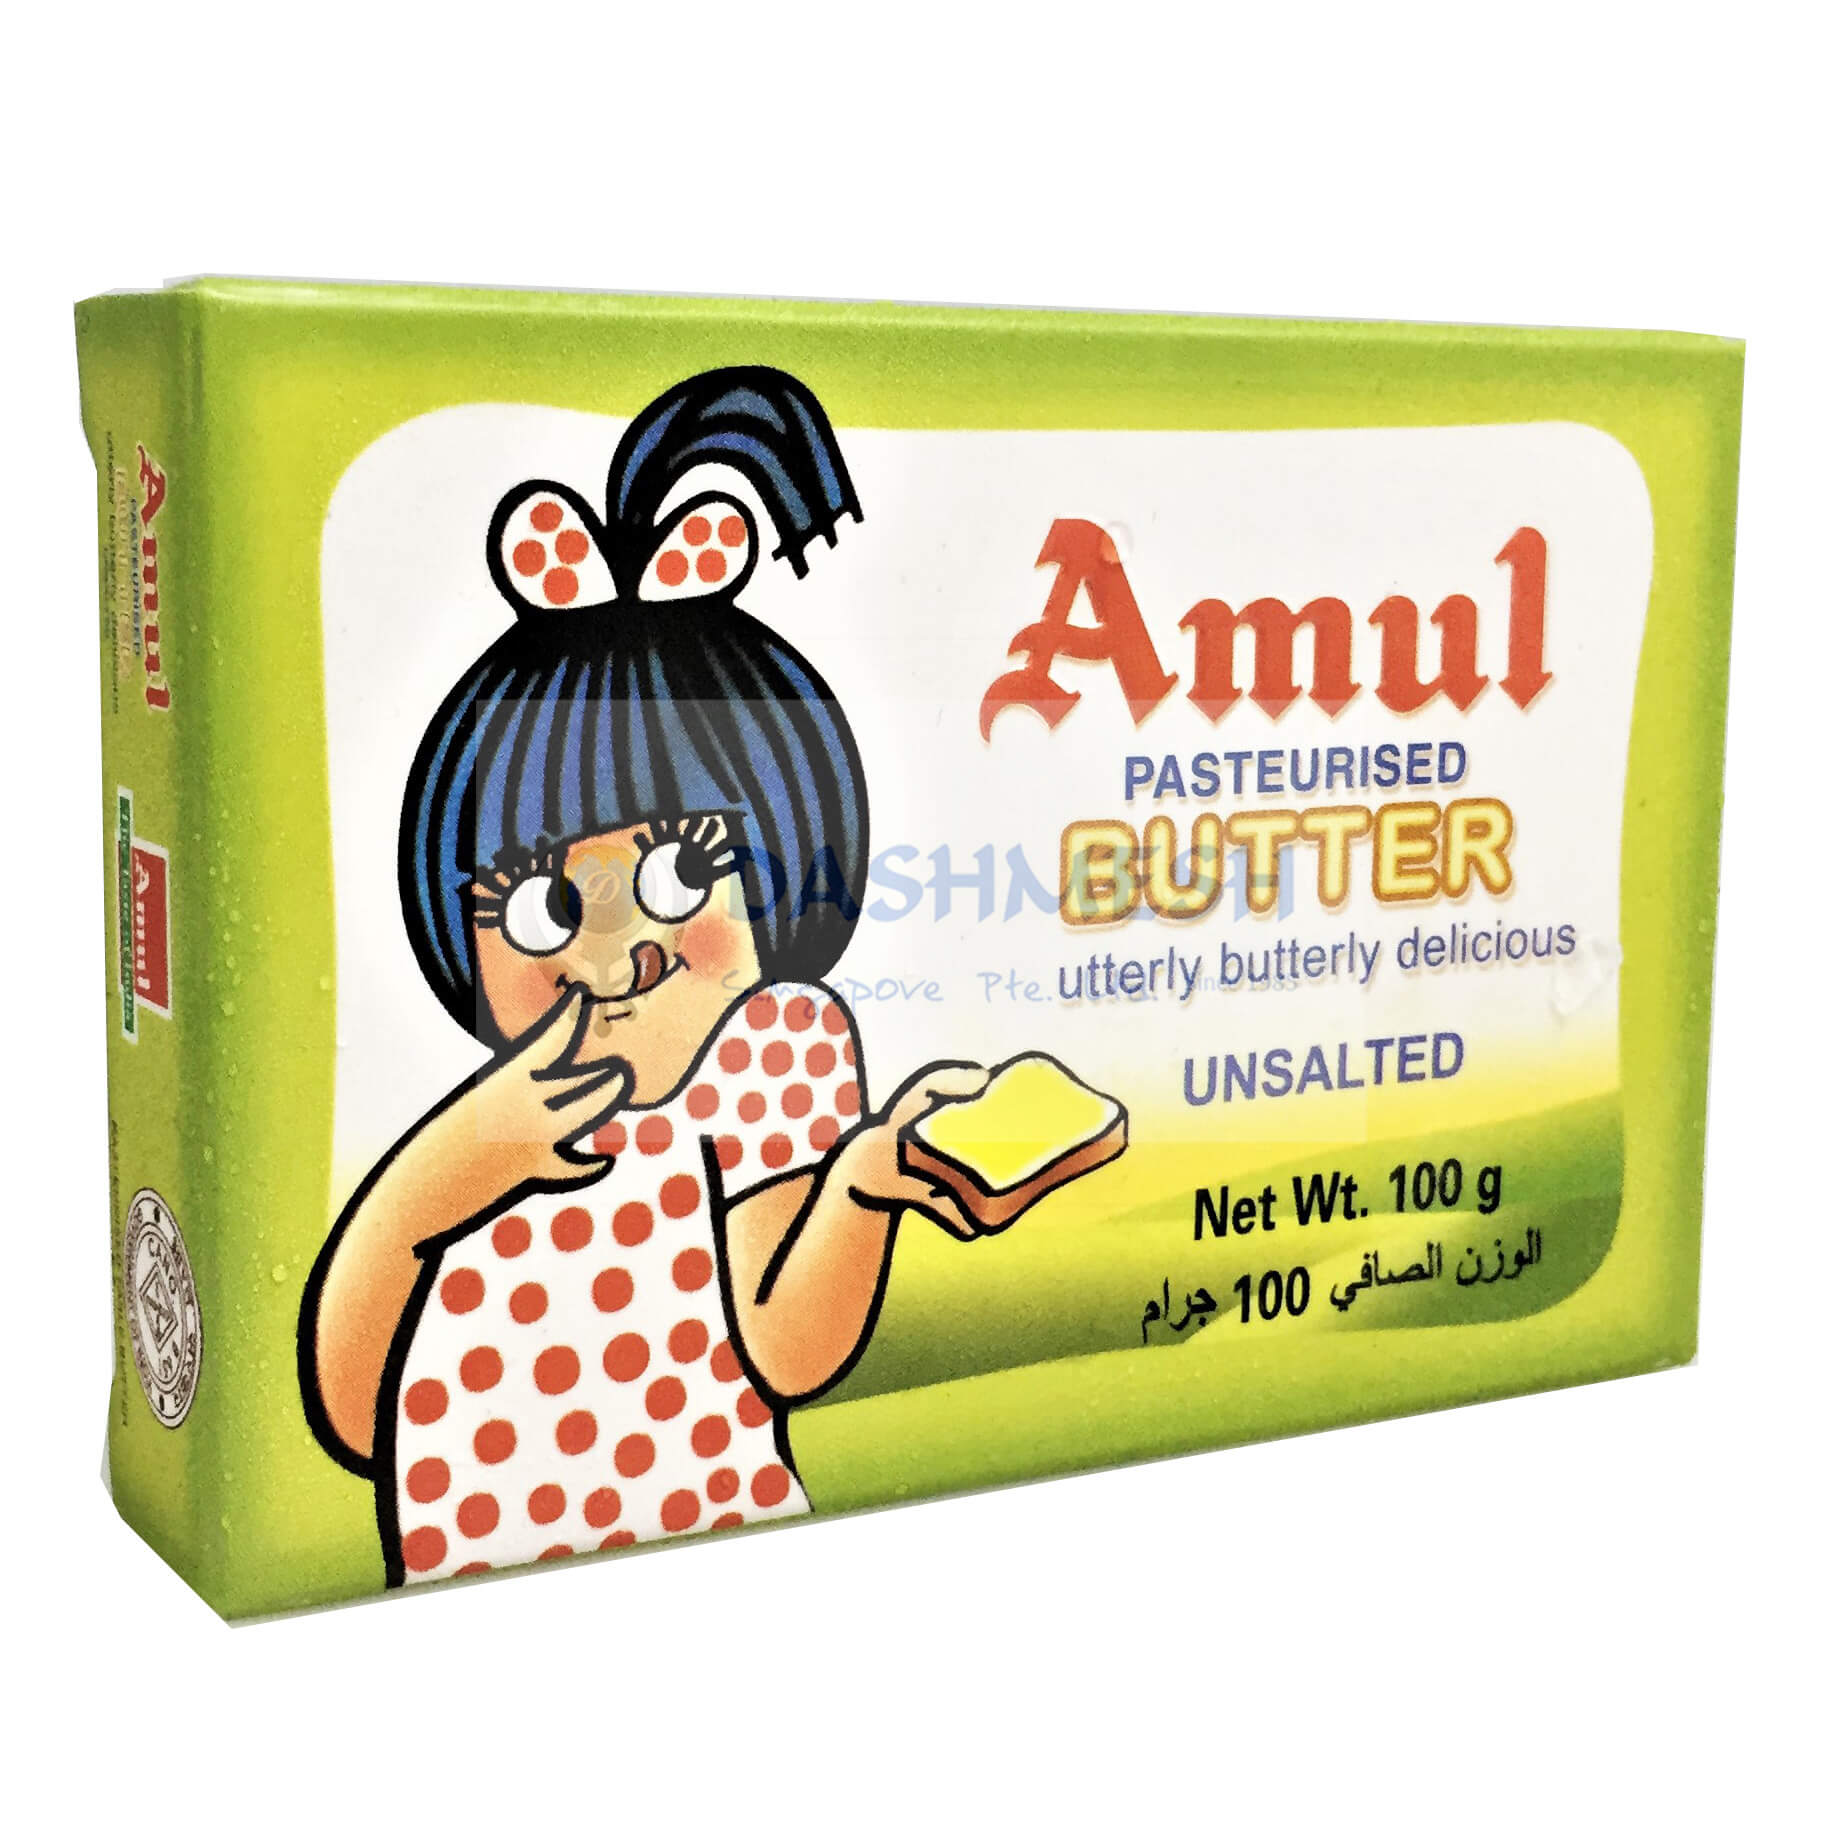 Amul Butter (Unsalted) 100g & 500g